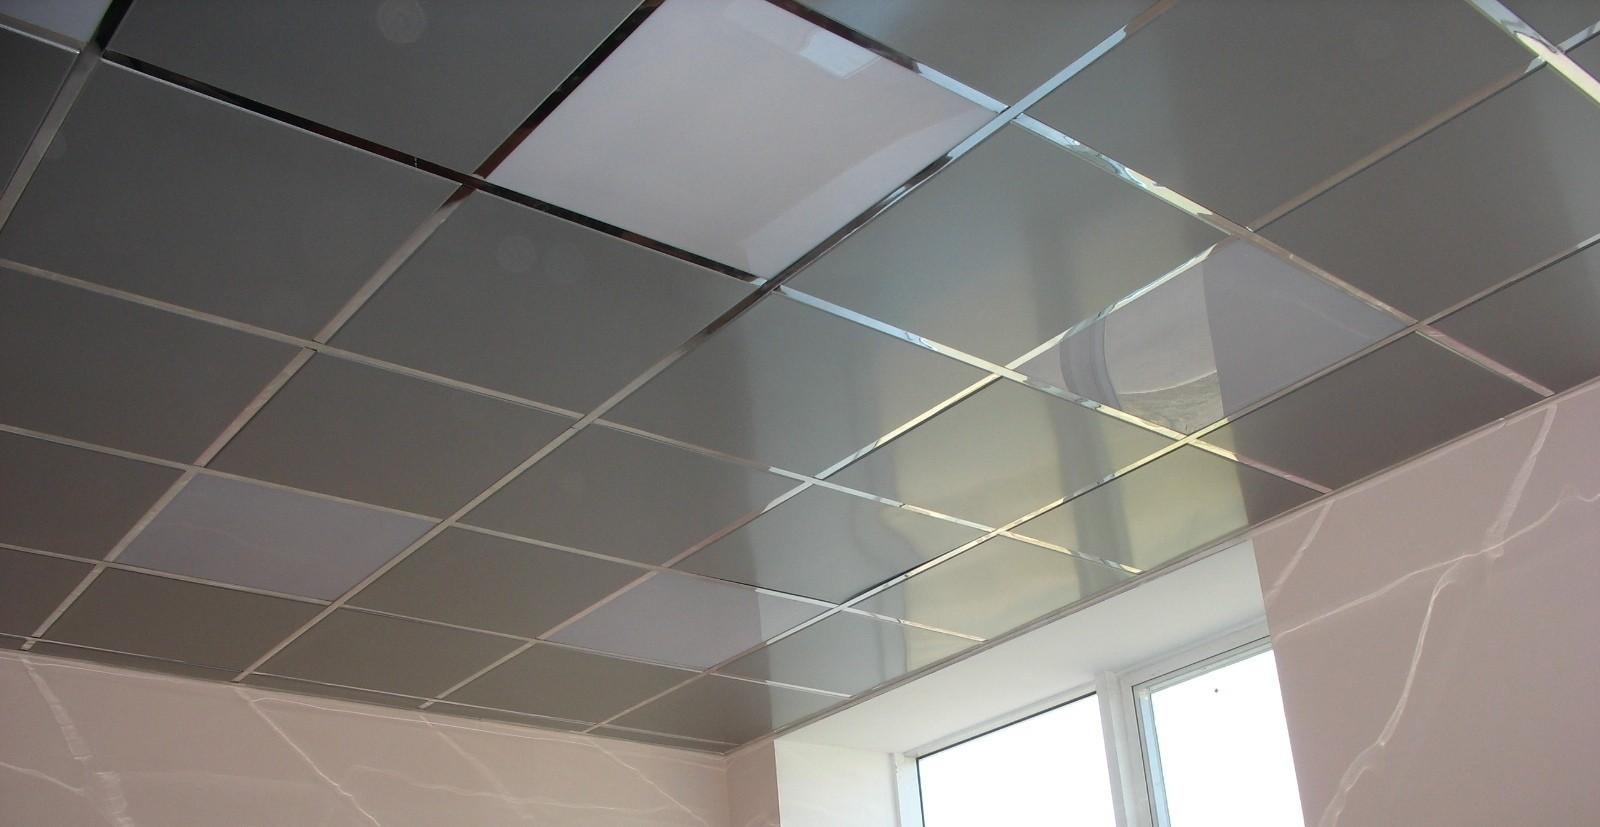 Потолок на кухне Панели из металла